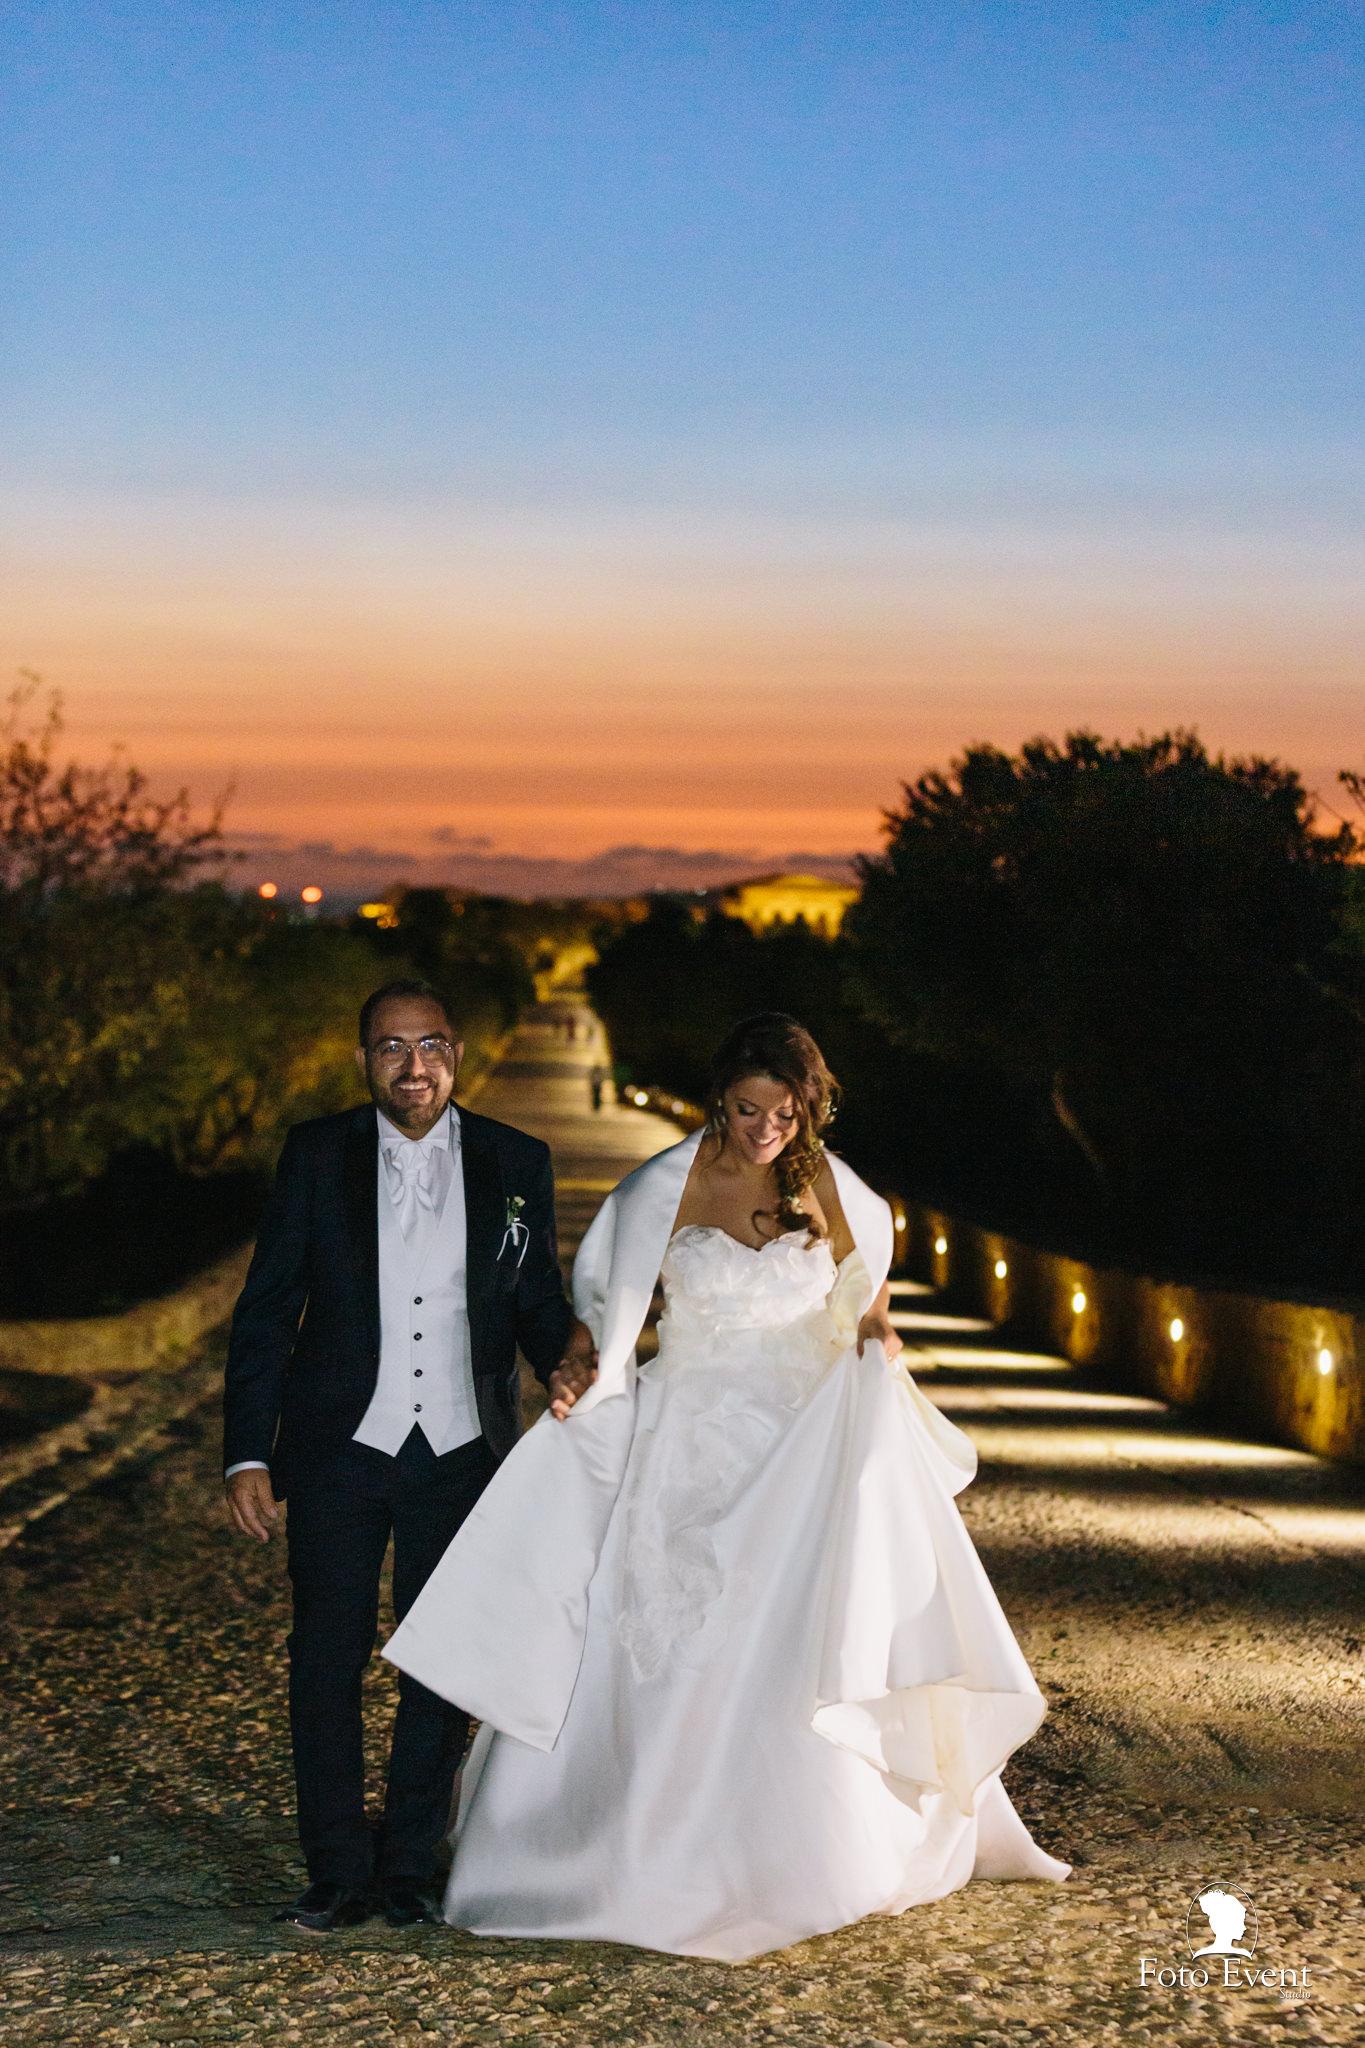 050-2020-10-15-Matrimonio-Noemi-e-Salvatore-Paterno-zoom-722